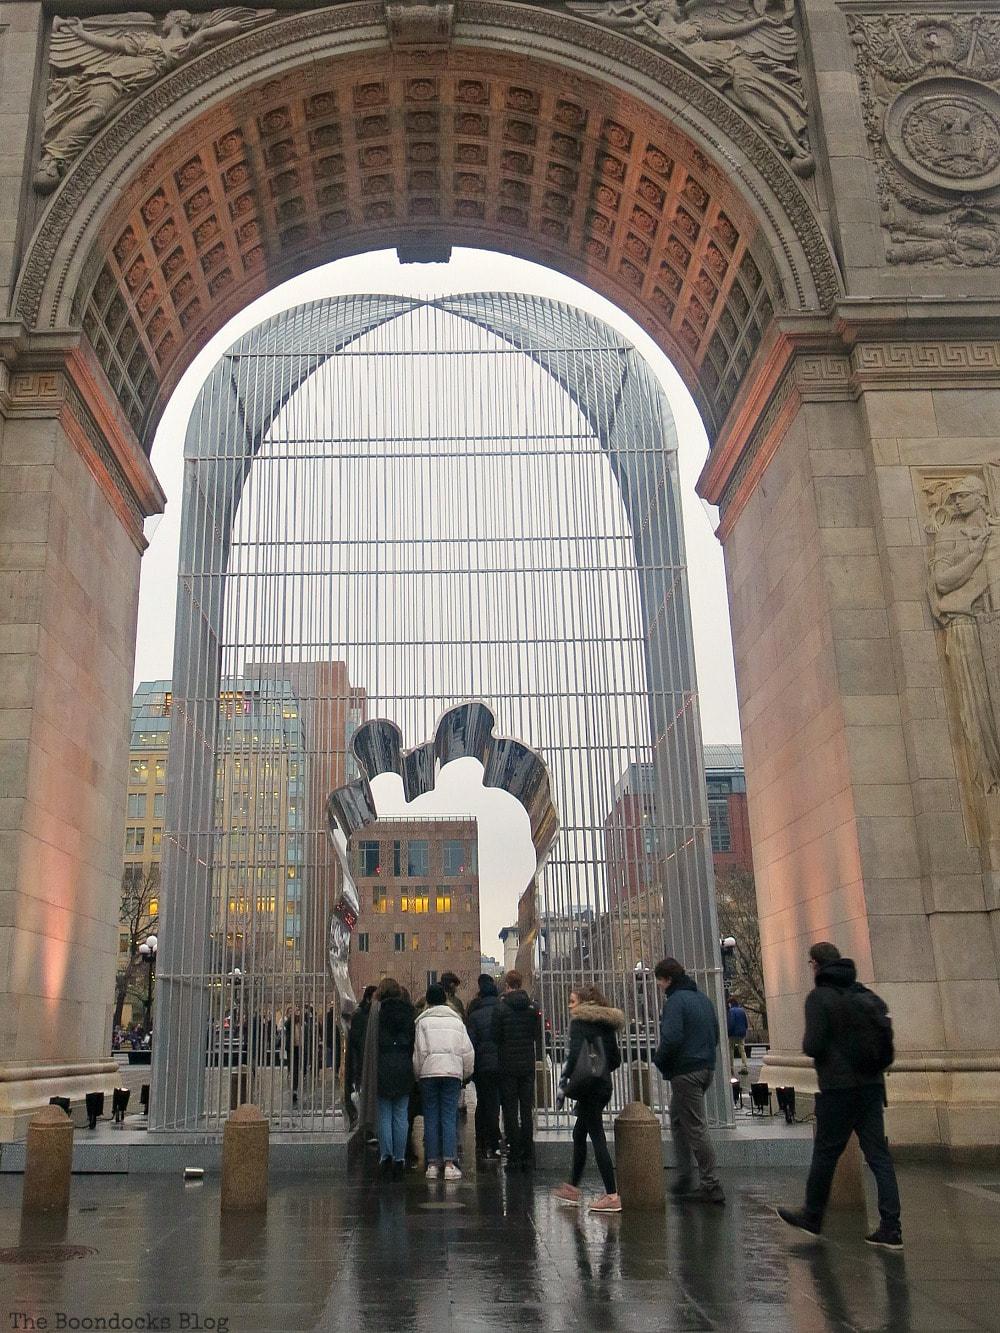 Exhibition by artist Ai Weiwei, #photoessay #Travel #photography #NewYork #Greenwichvillage #NYU #WashingtonSquarePark Interesting things to see in Greenwich Village www.theboondocksblog.com